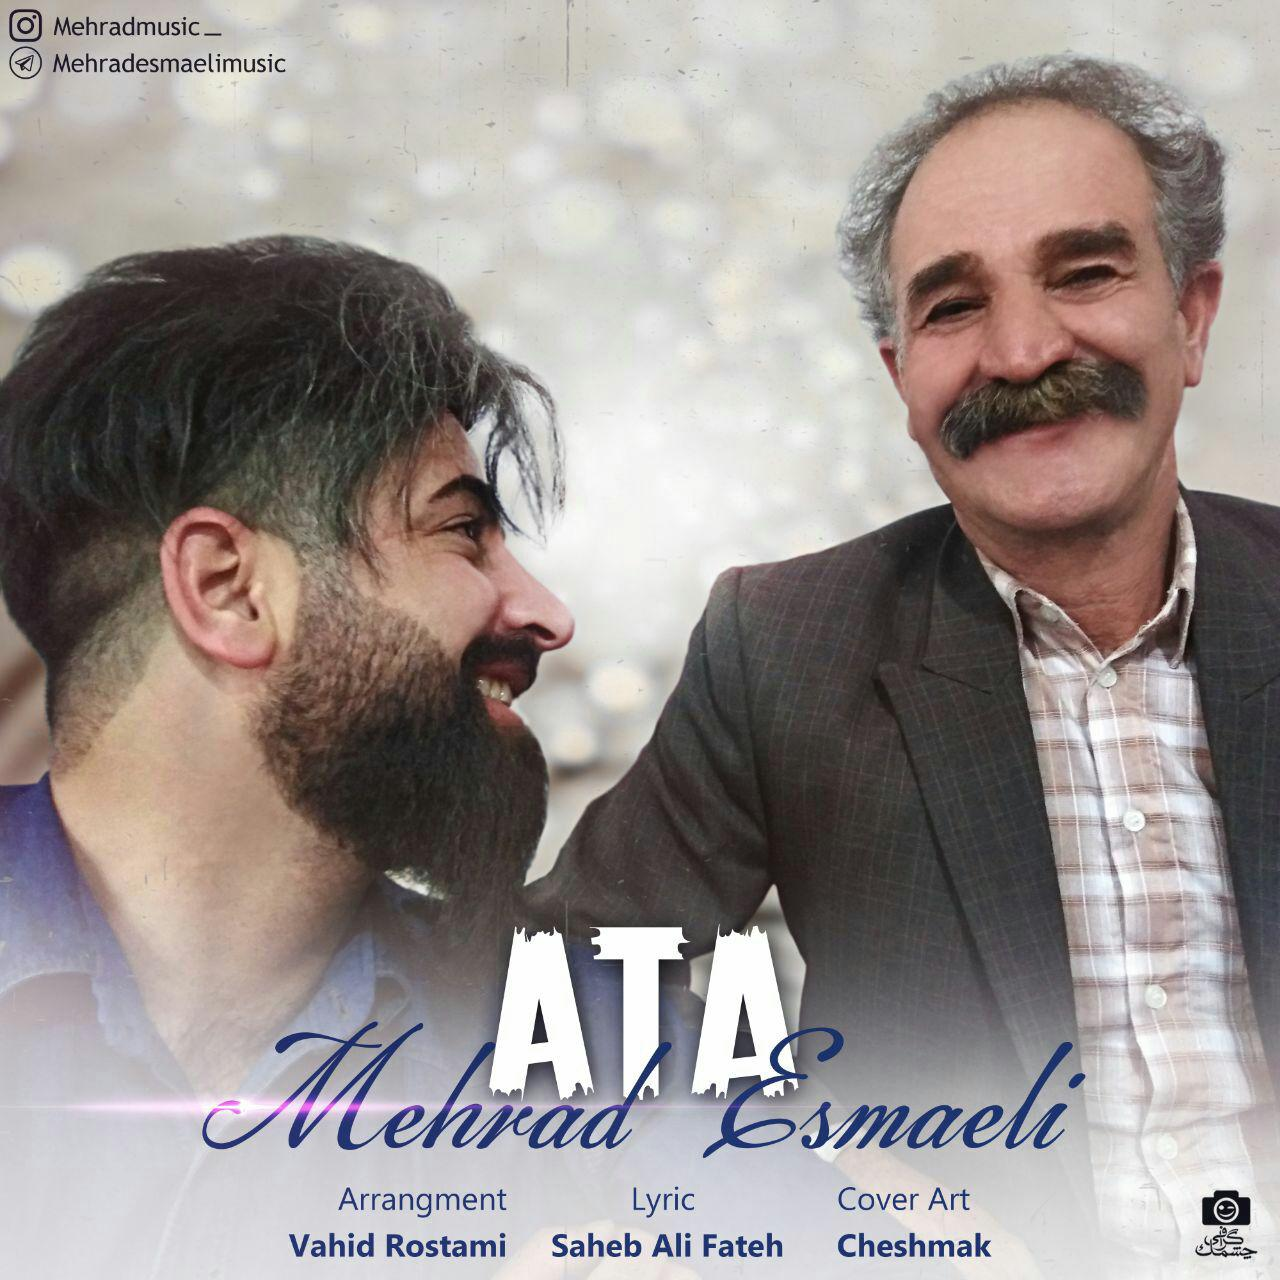 http://s9.picofile.com/file/8357644576/09Mehrad_Esmaeili_Ata.jpg